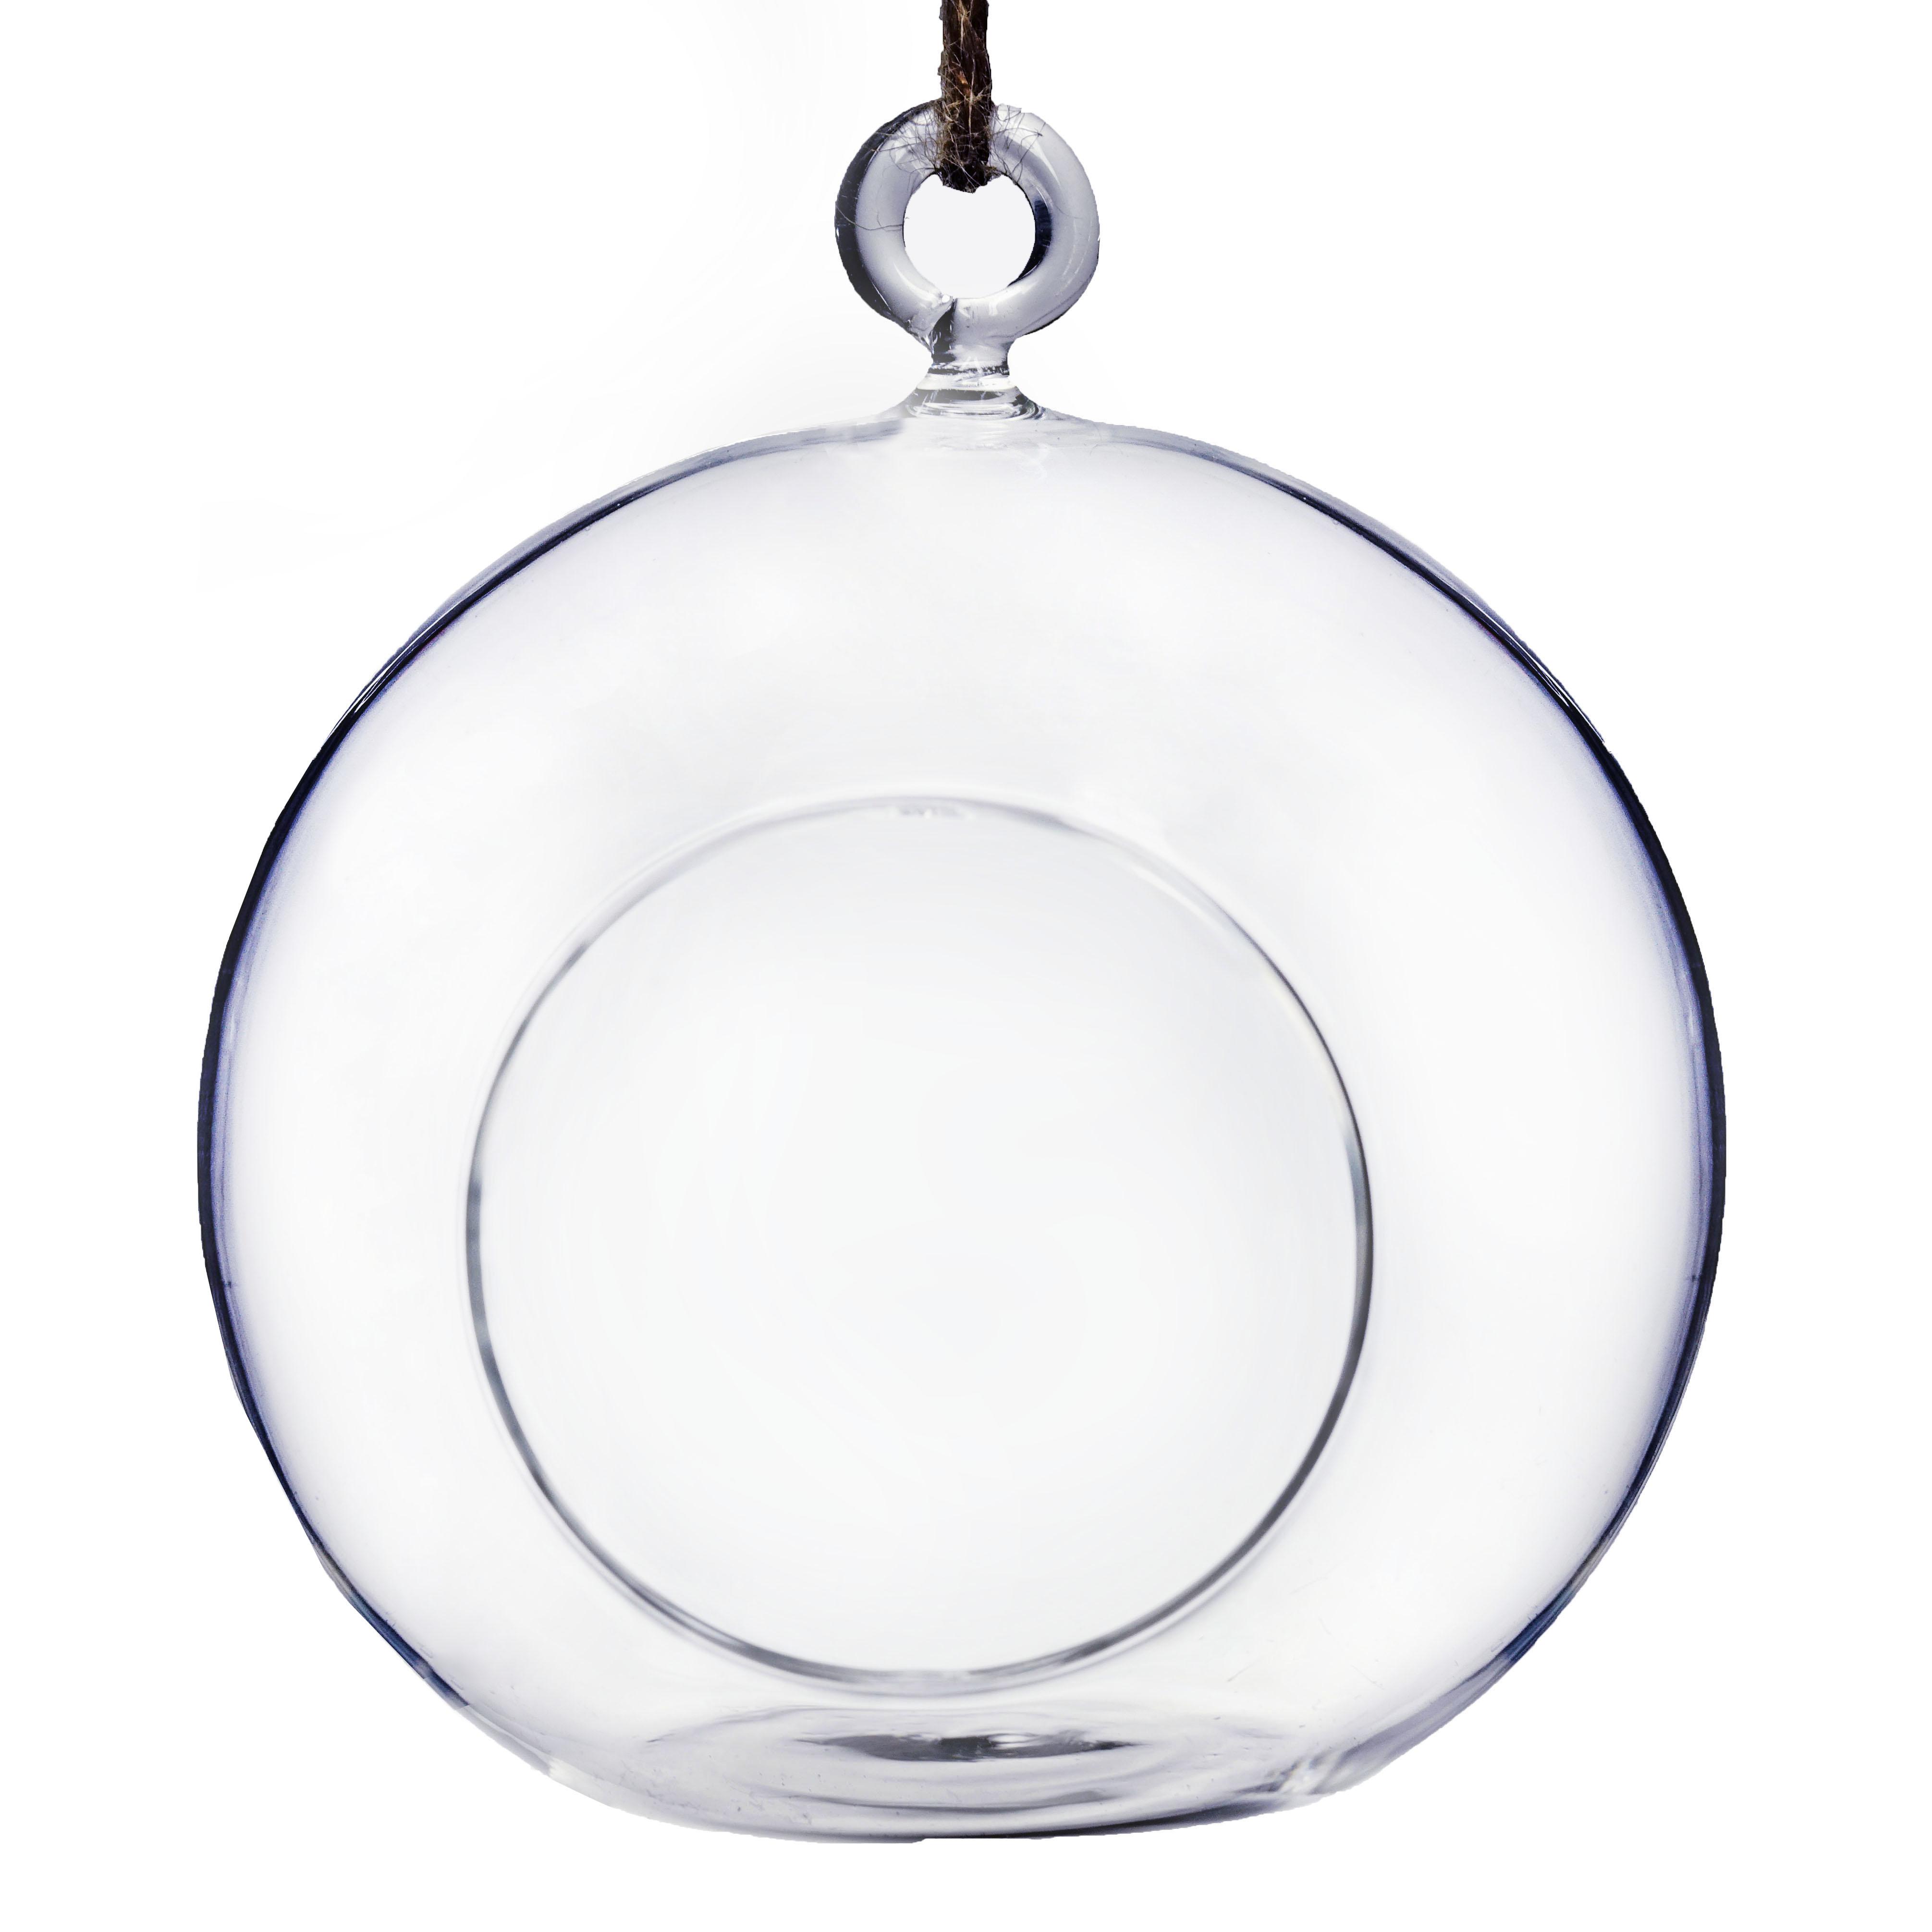 BalsaCircle Globe 4 pcs Clear Glass Terrariums - Hanging Bowl Plants Wedding Party Centerpieces Decorations Home Supplies